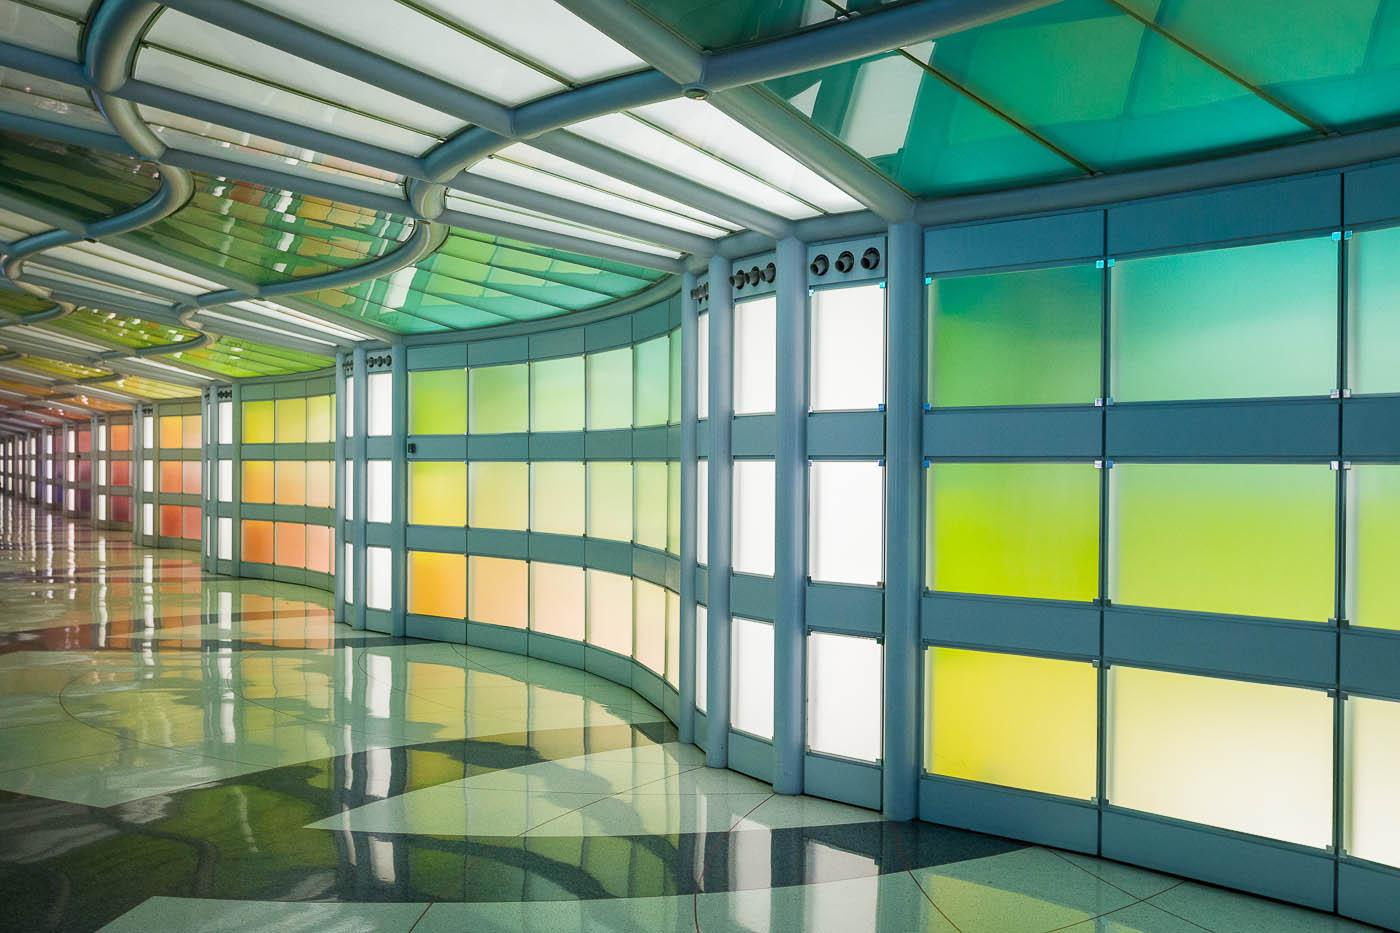 ILyons_Light Wall, O'Hare International Airport.JPG